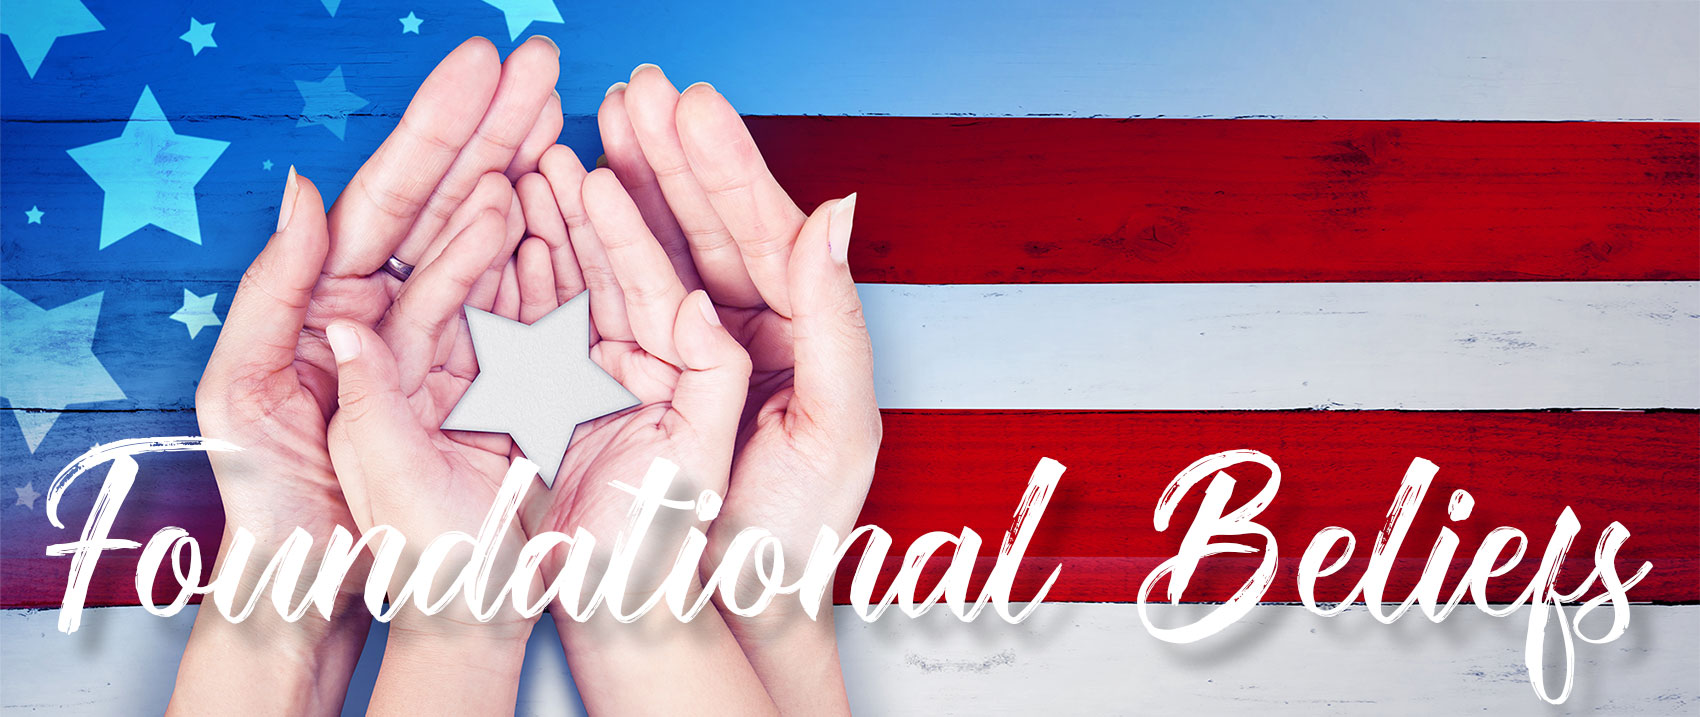 Moms For America - Foundational Beliefs